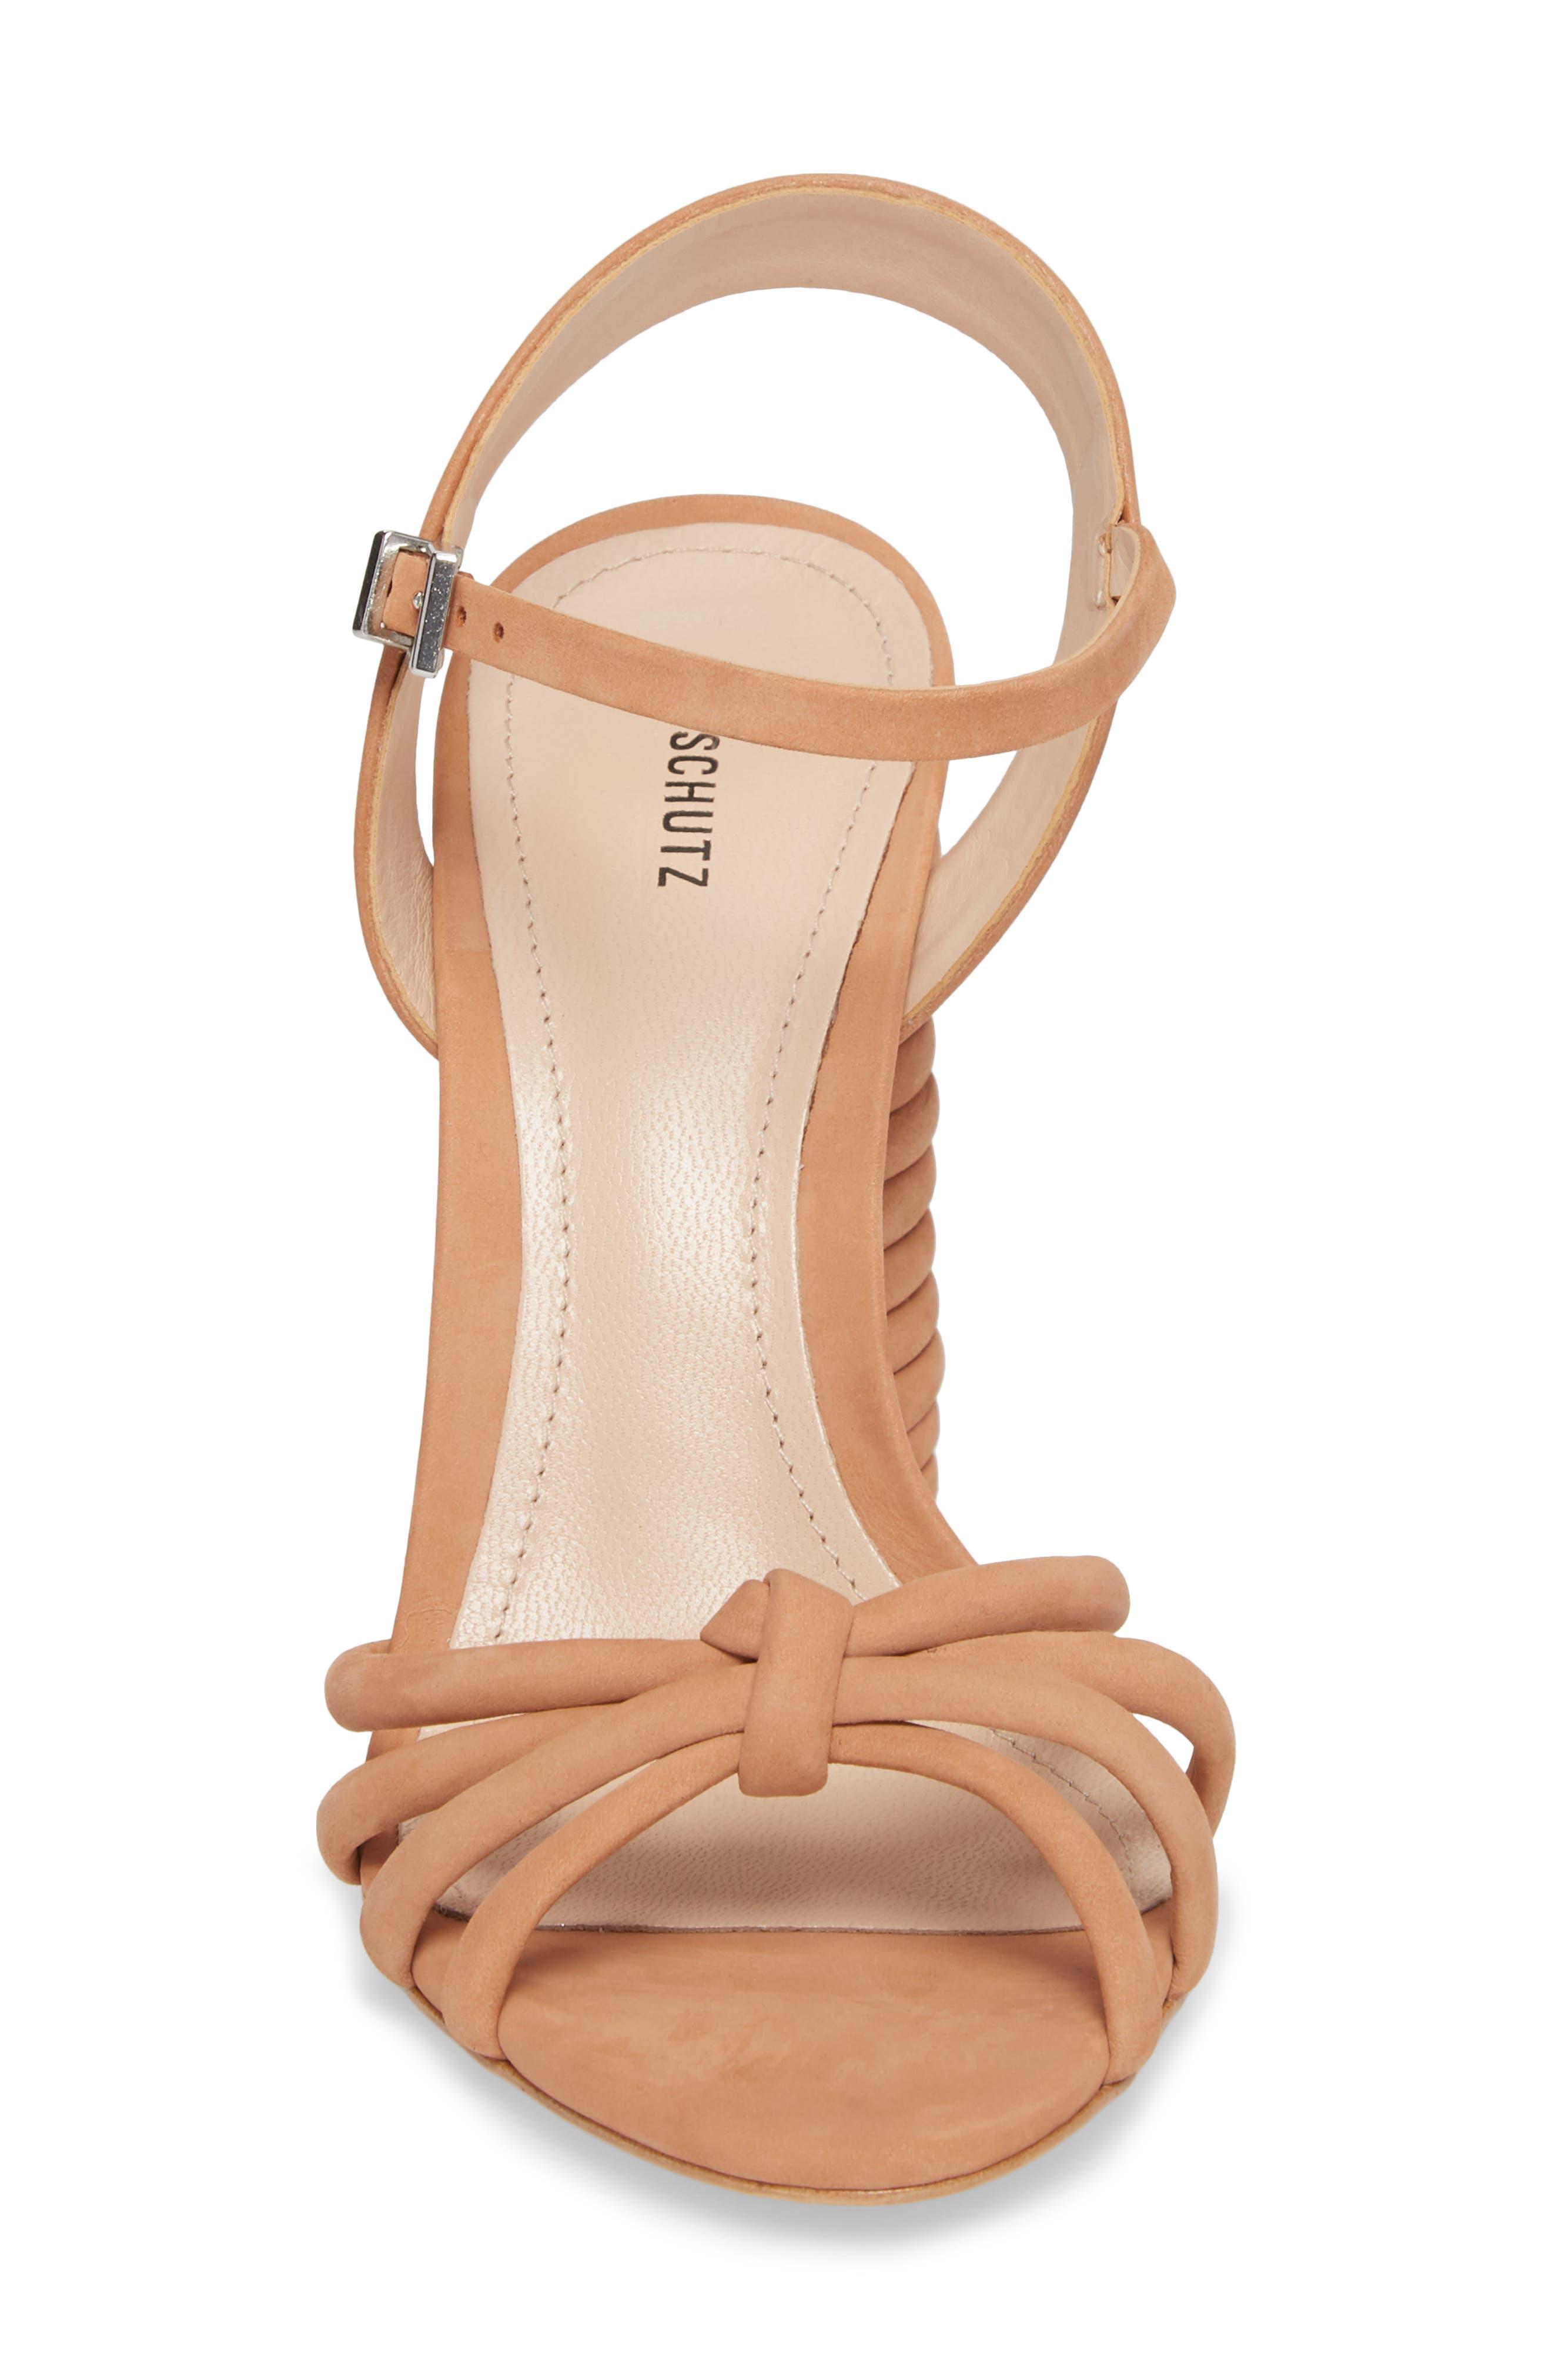 Paolla Column Heel Sandal,                             Alternate thumbnail 4, color,                             TOASTED NUT